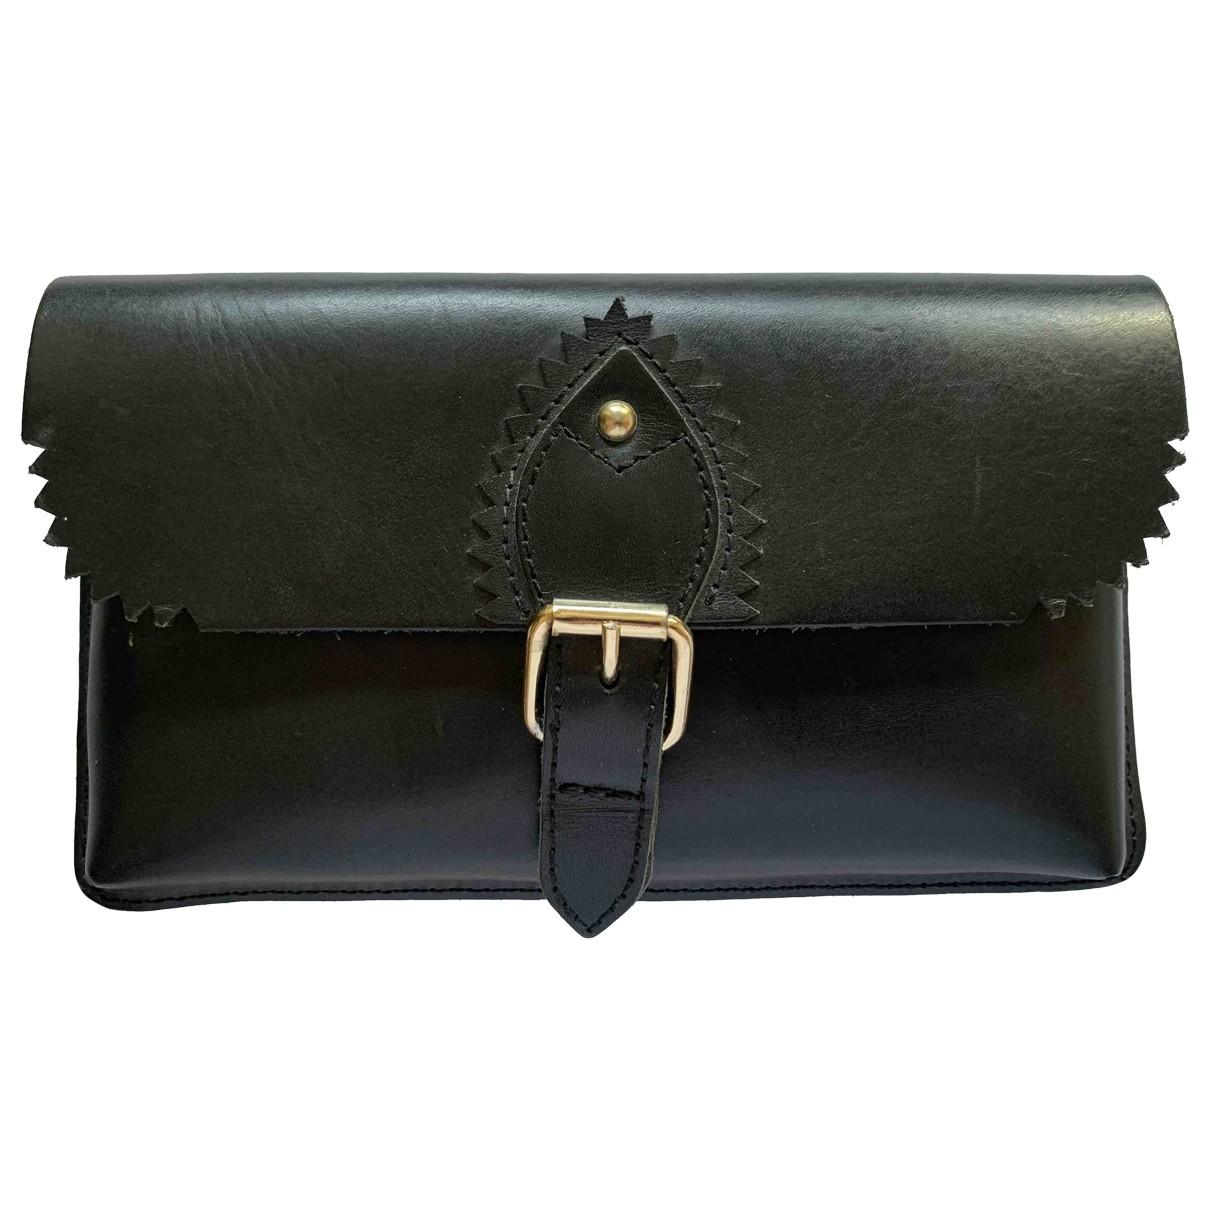 & Stories \N Black Leather wallet for Women \N